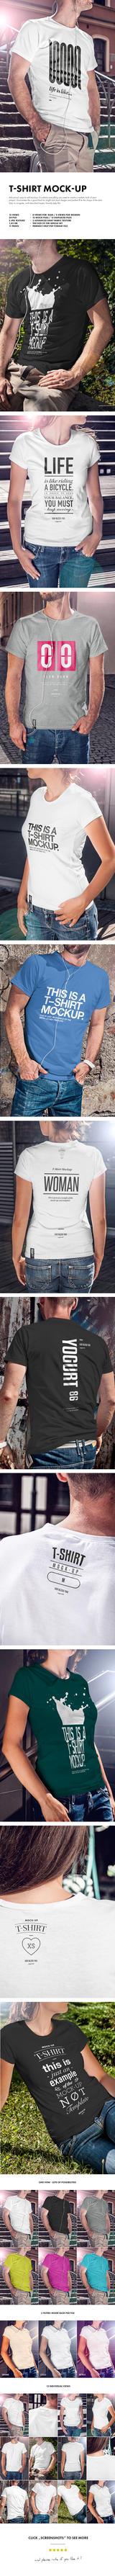 T-Shirt Mock-up by yogurt86